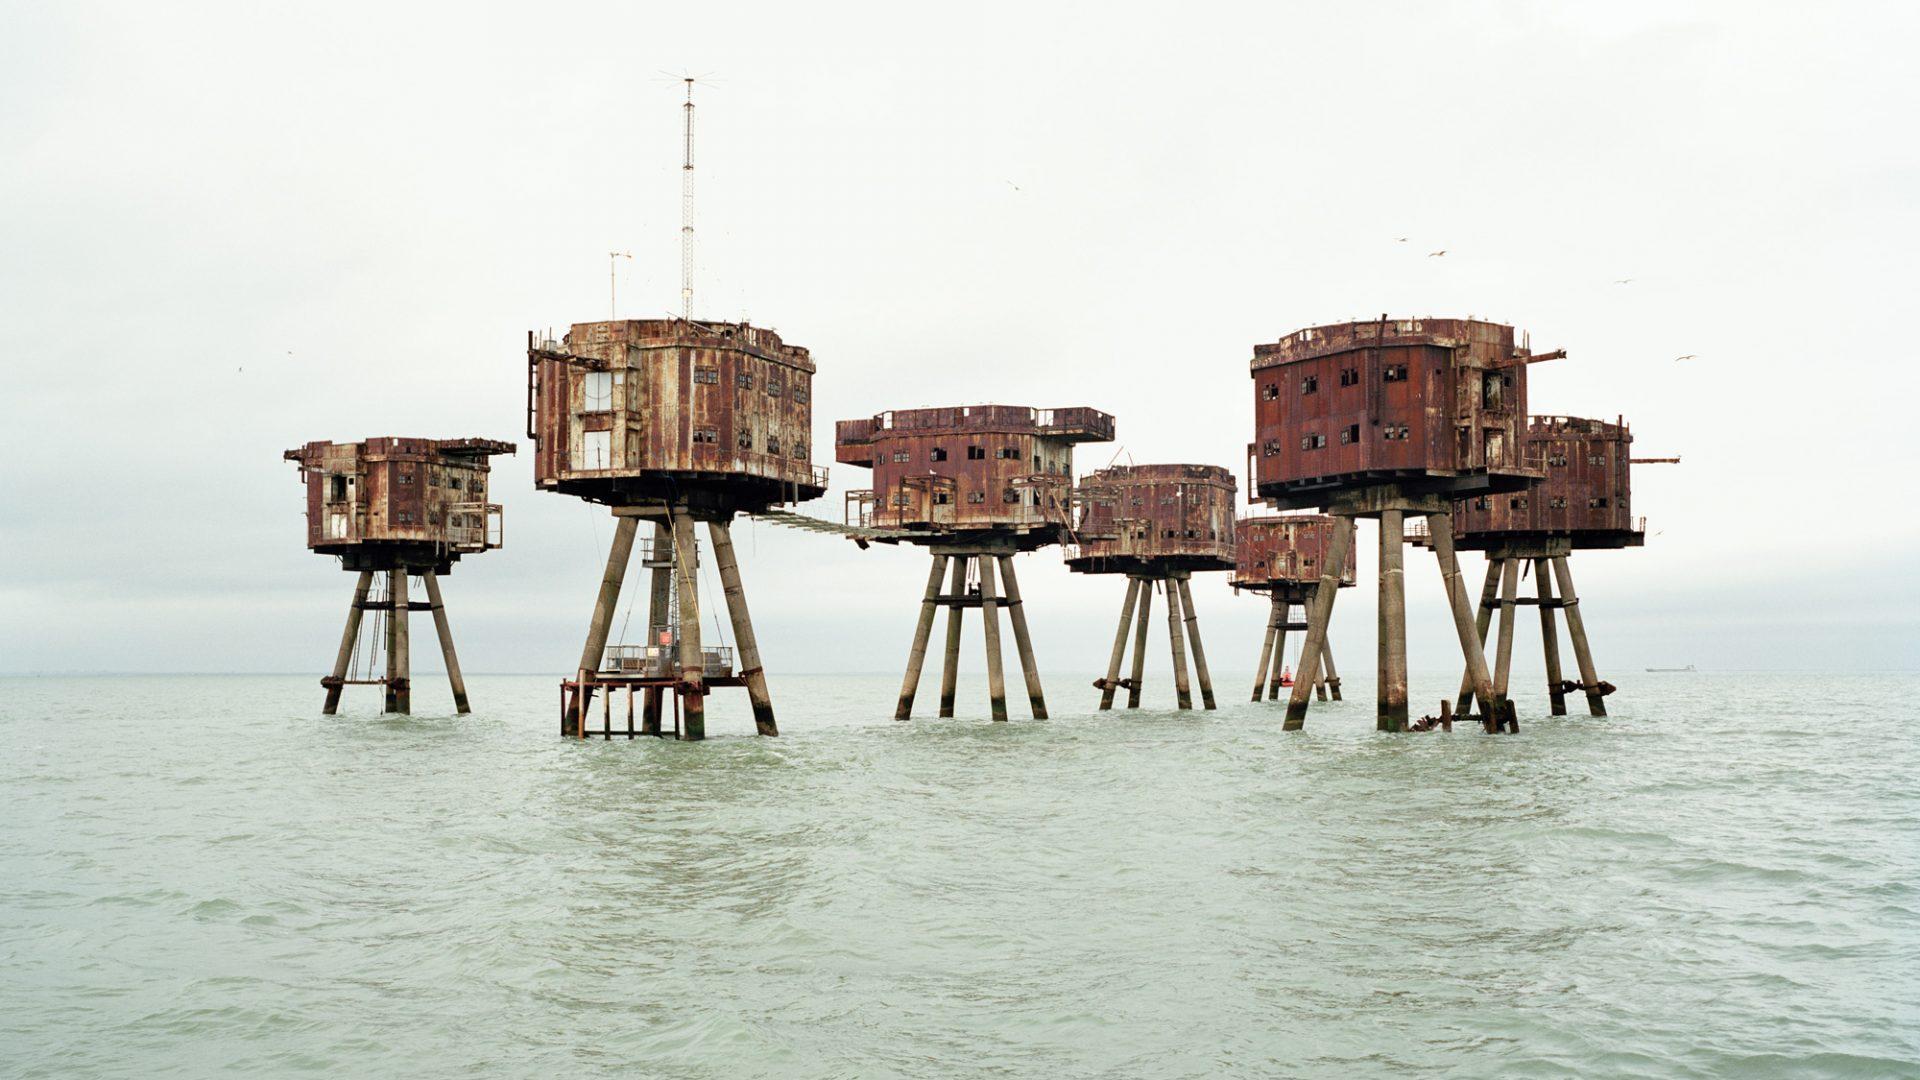 Redsands Sea Forts Restoration, Thames Estuary, 2015 by Chloe Dewe Mathews. All photos: Chloe Dewe Mathews.